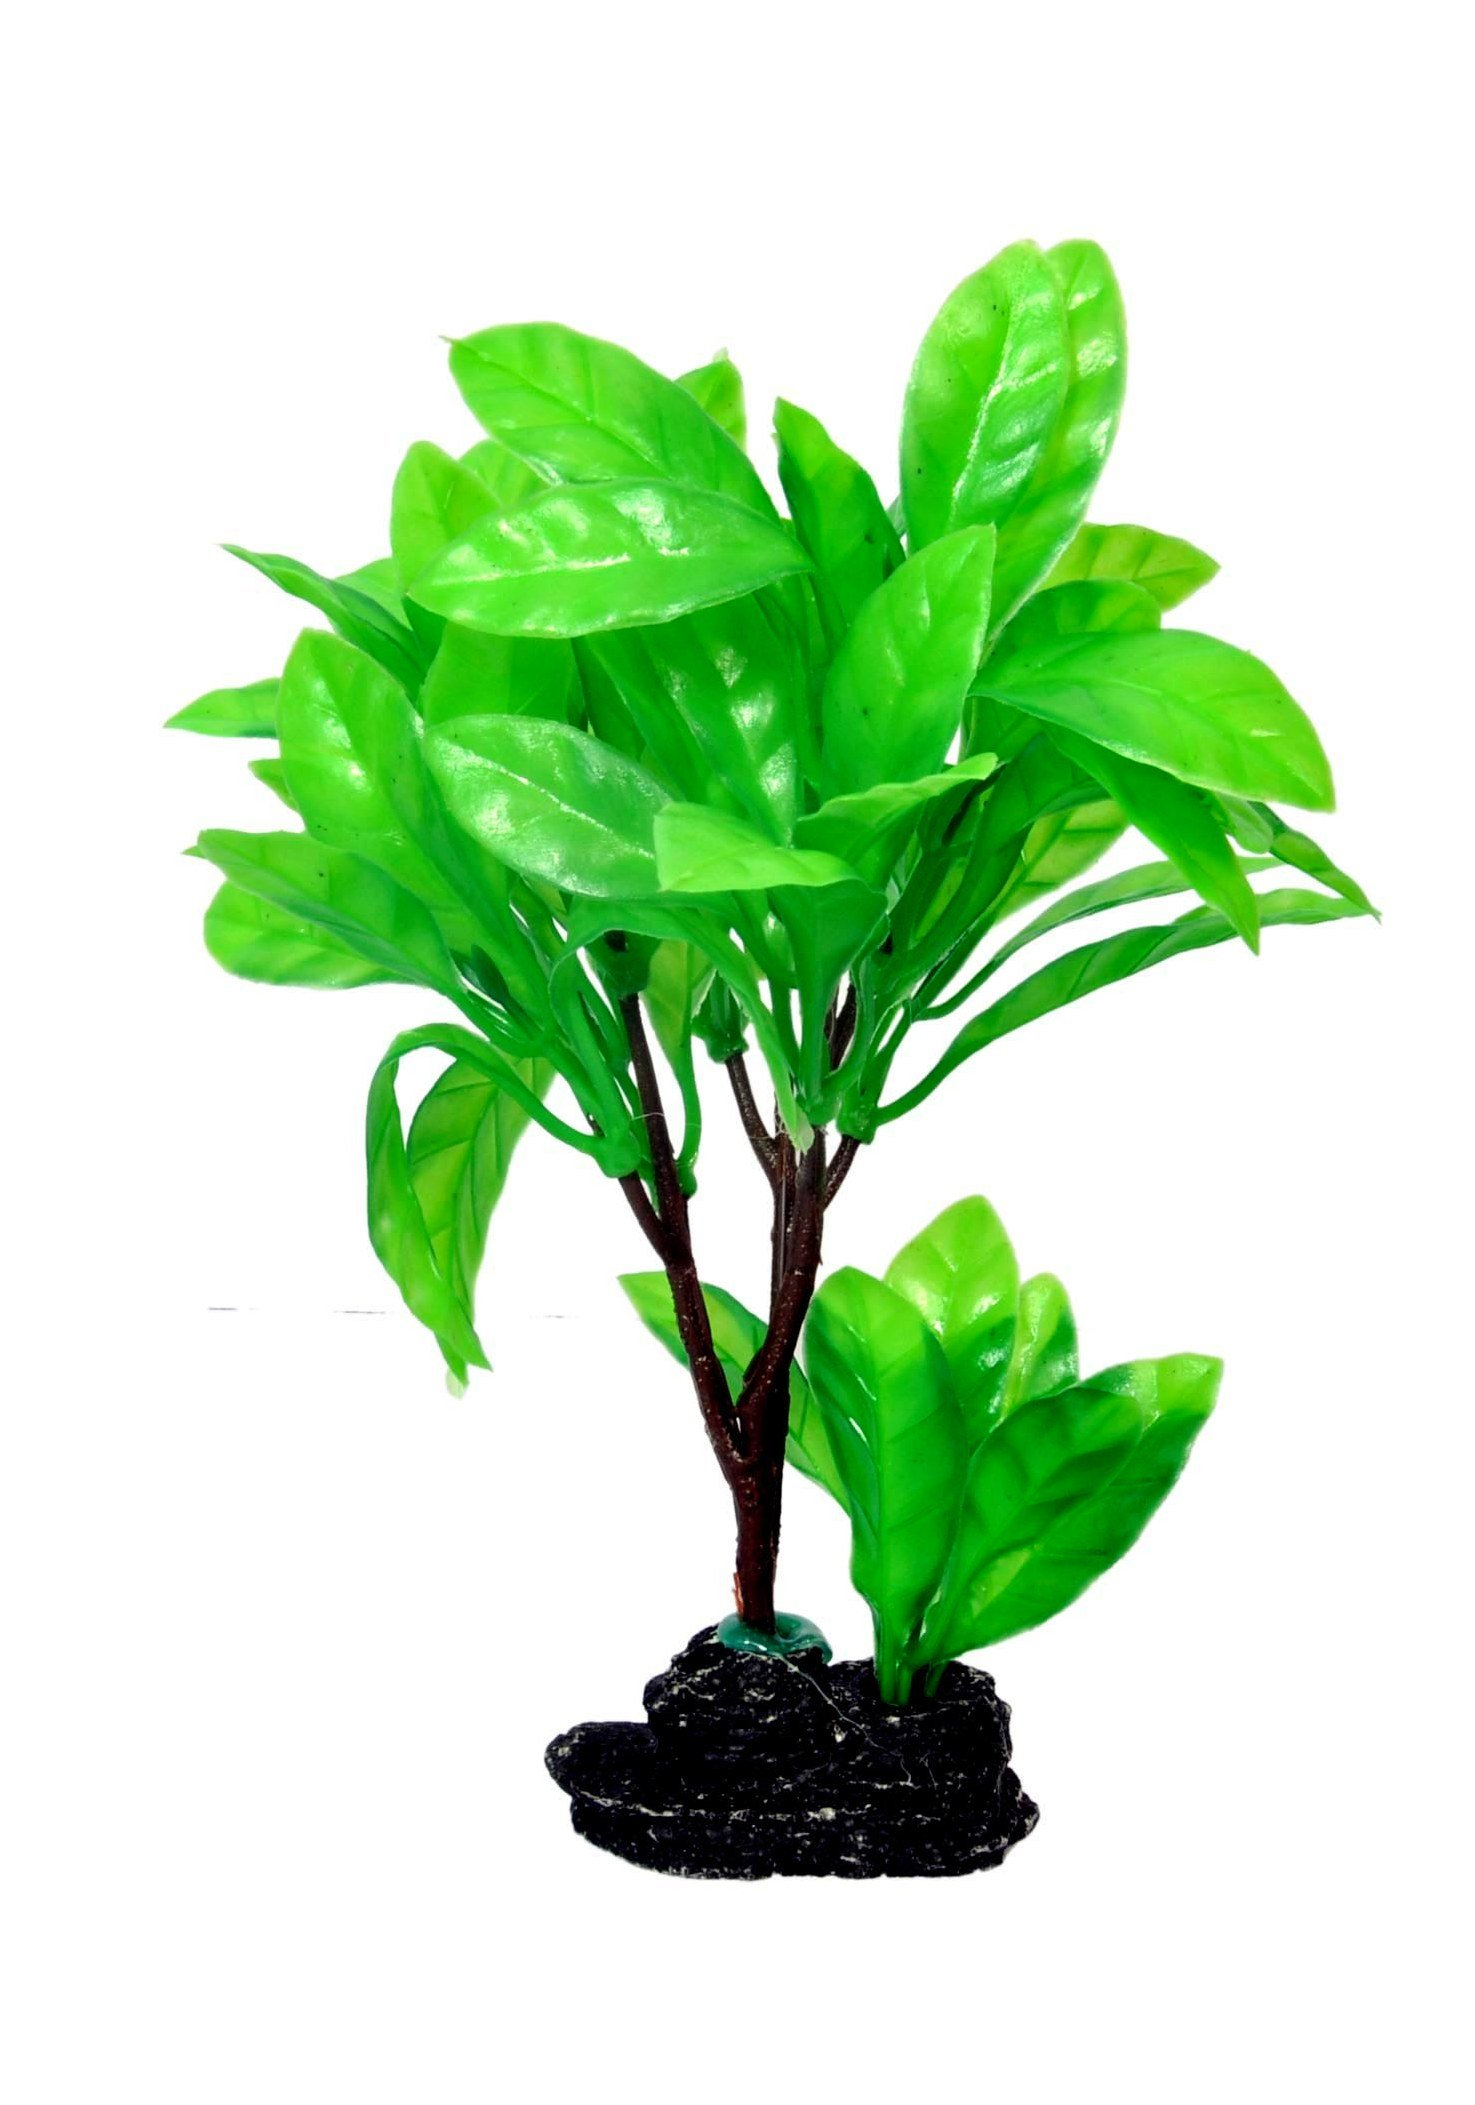 Amazon price history for Aquarium Resin Artificial Plant Fish Tank Ornament Tree/Home Decoration